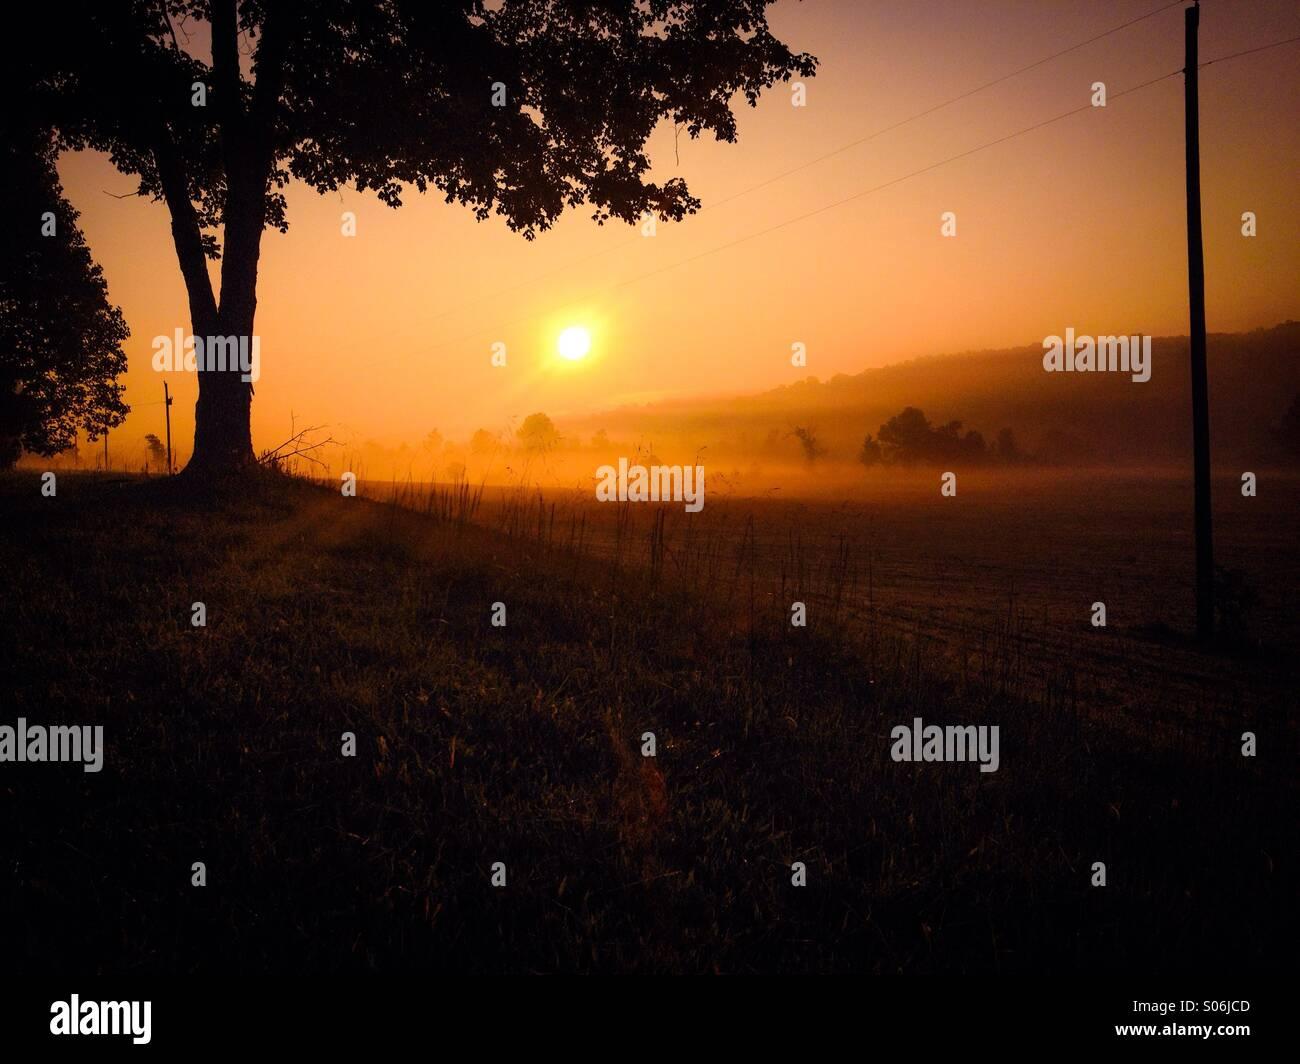 Foggy hayfield - Stock Image